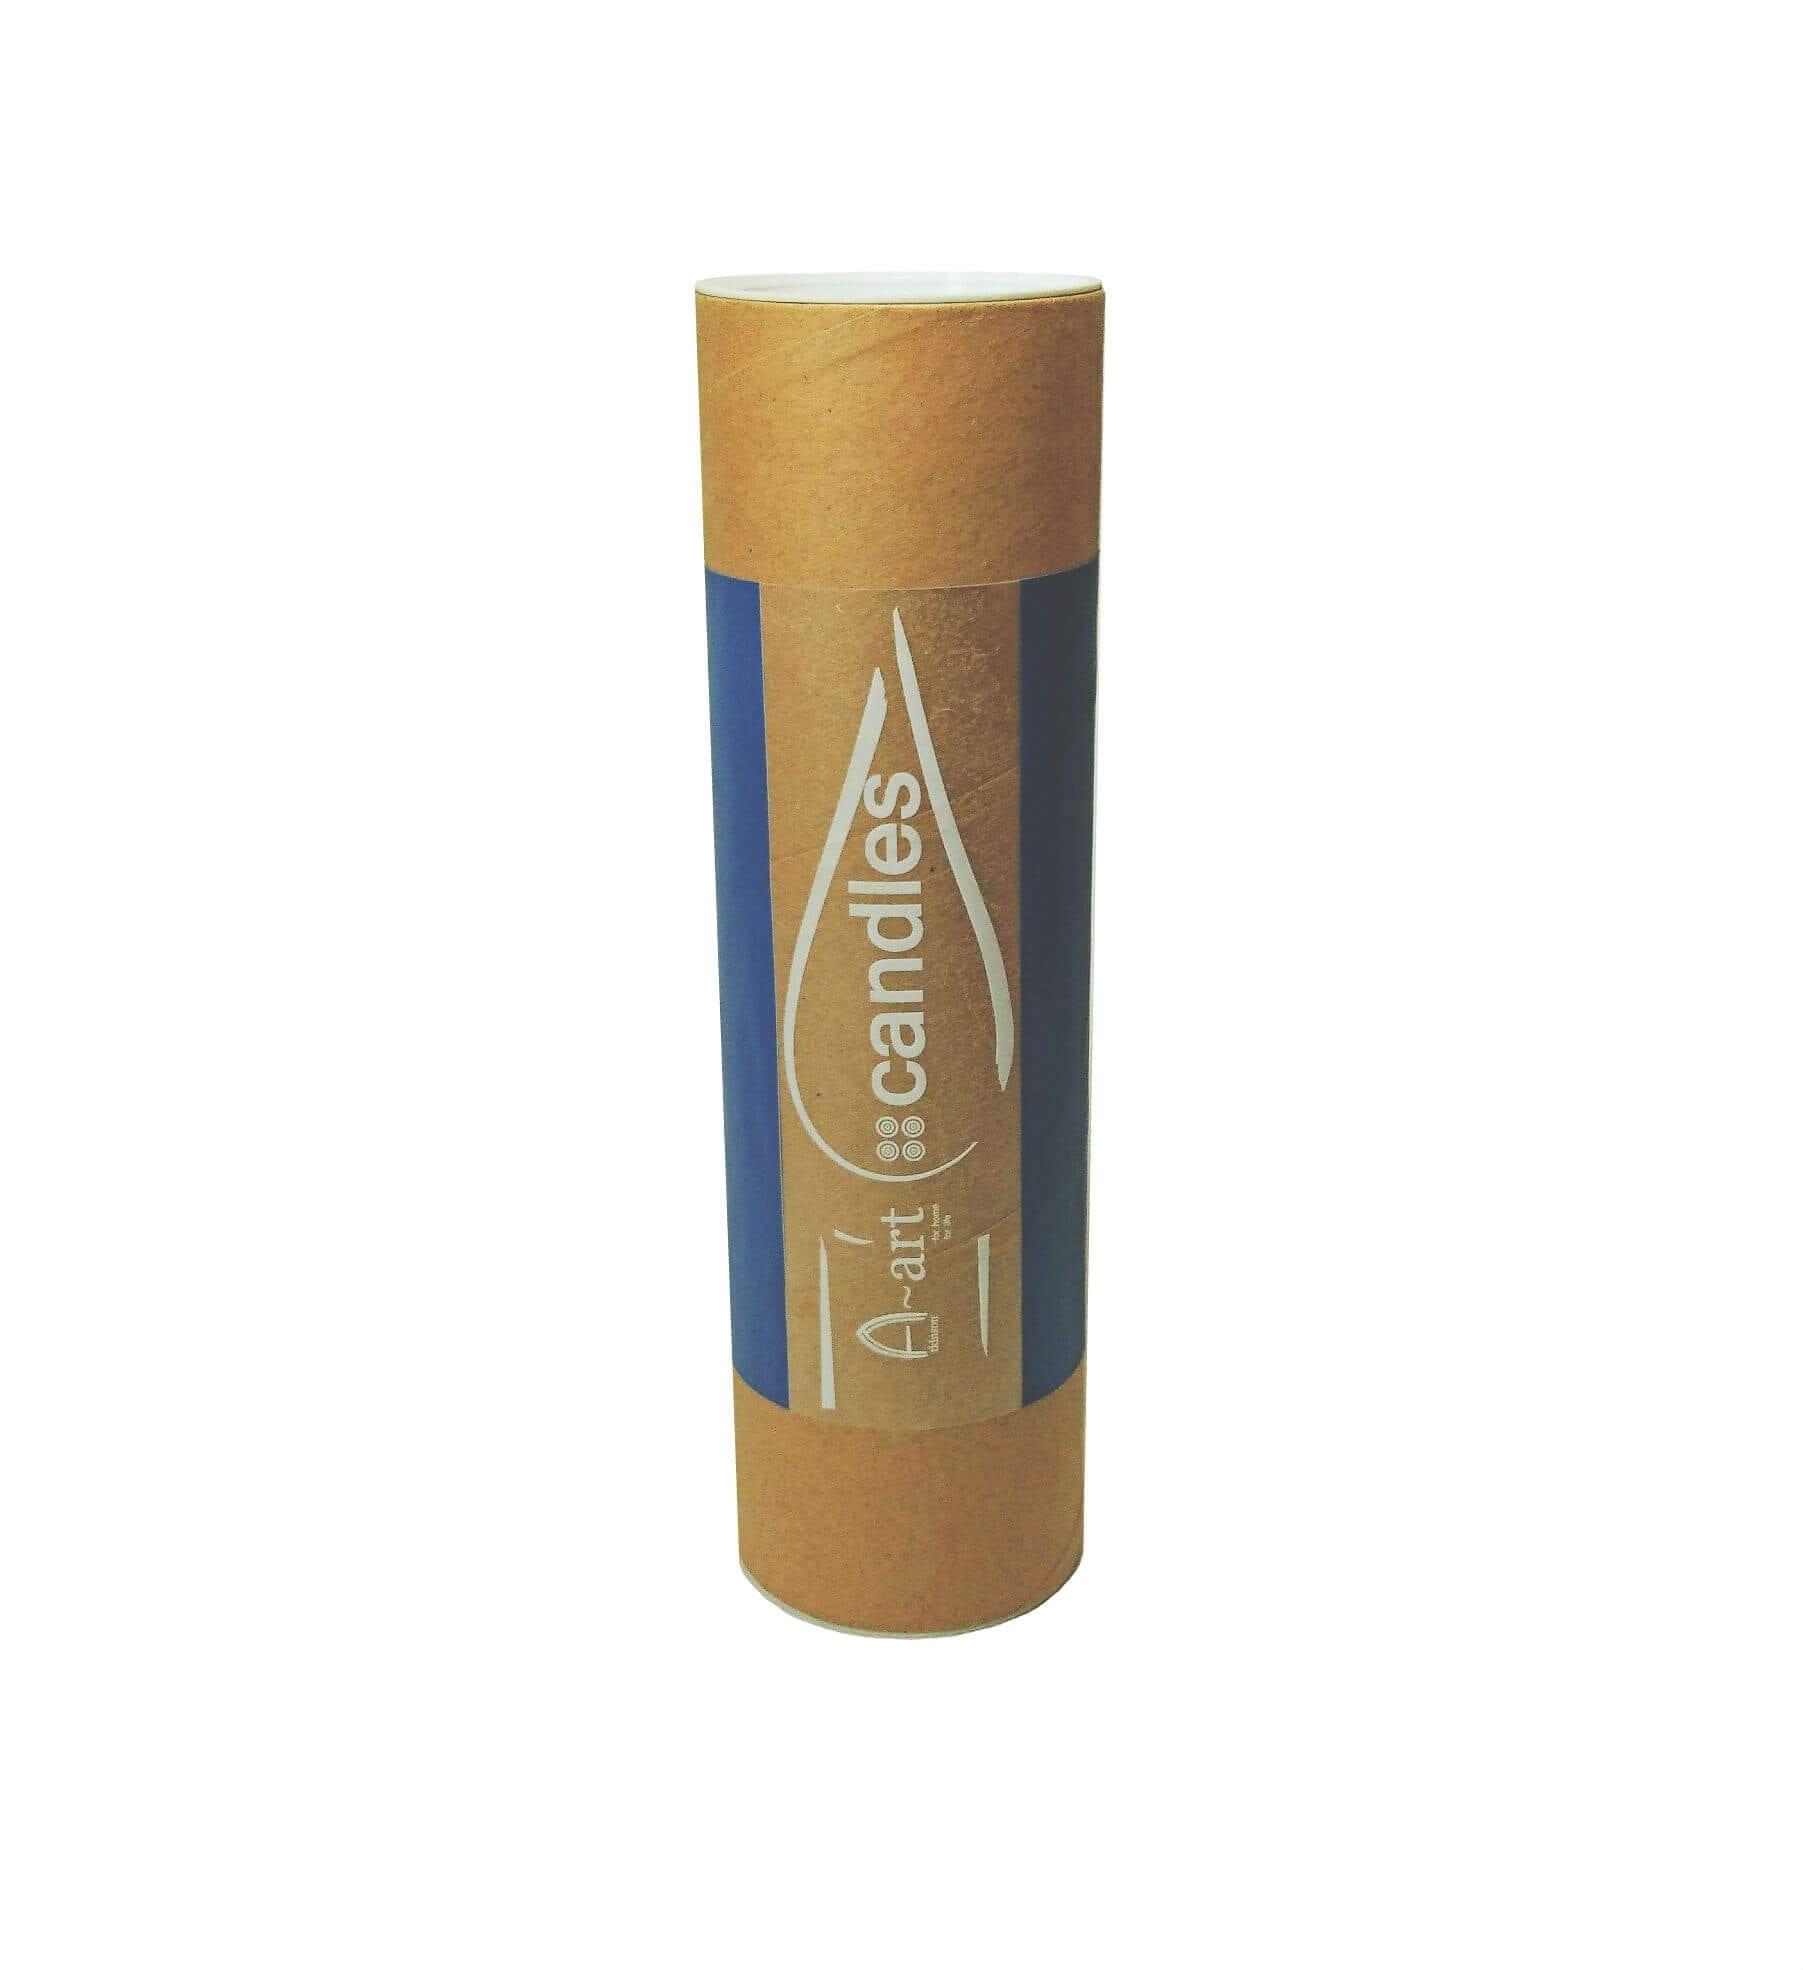 sea-blue-dinner-candles-storage-tube